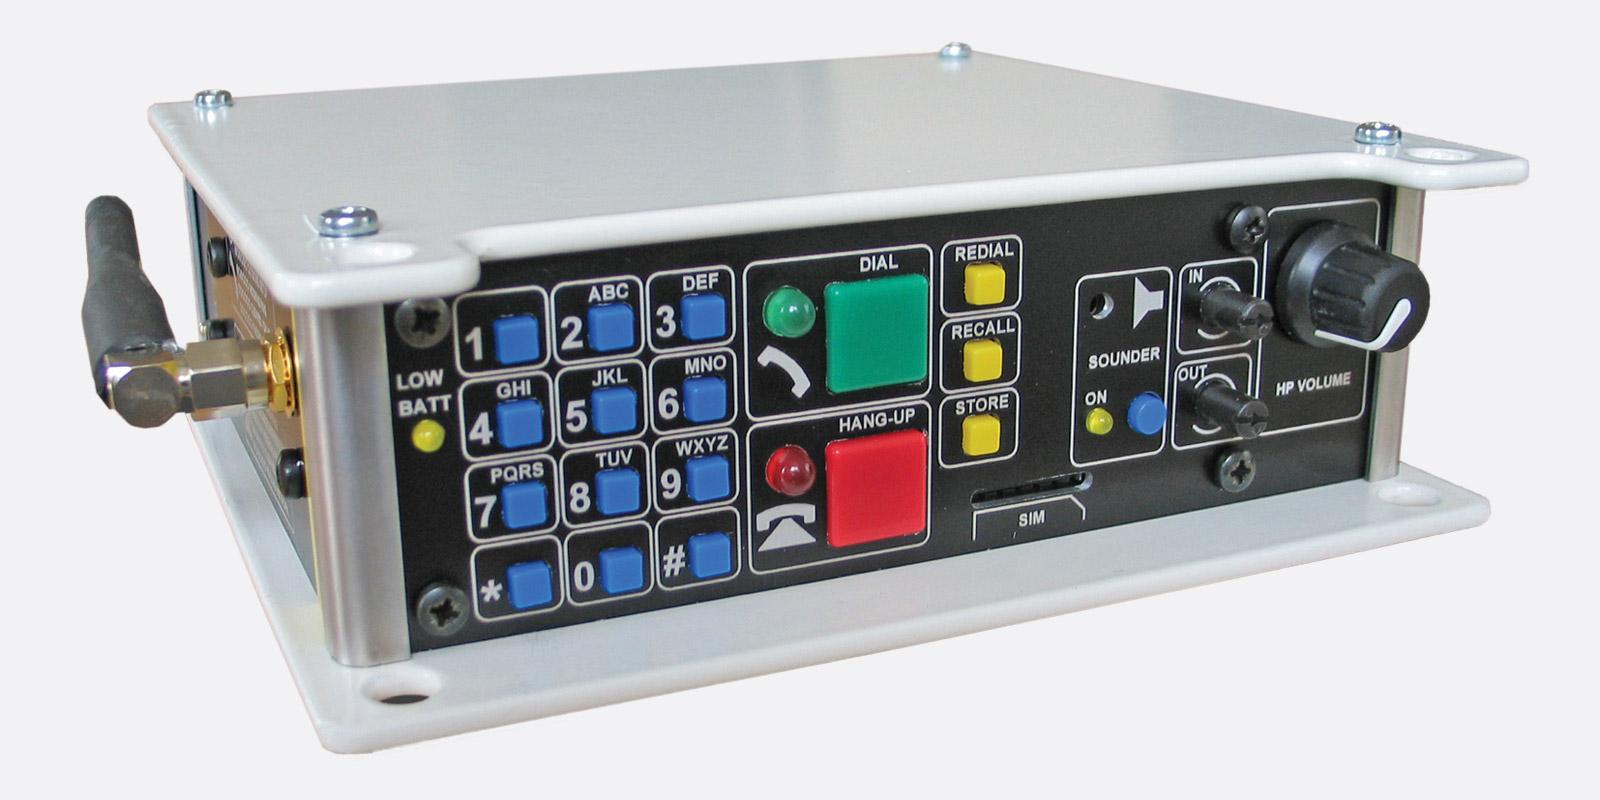 Glensound Gs Mpi004 Mobile Phone 2g Gsm Portable Telephone Status Indicator Circuit